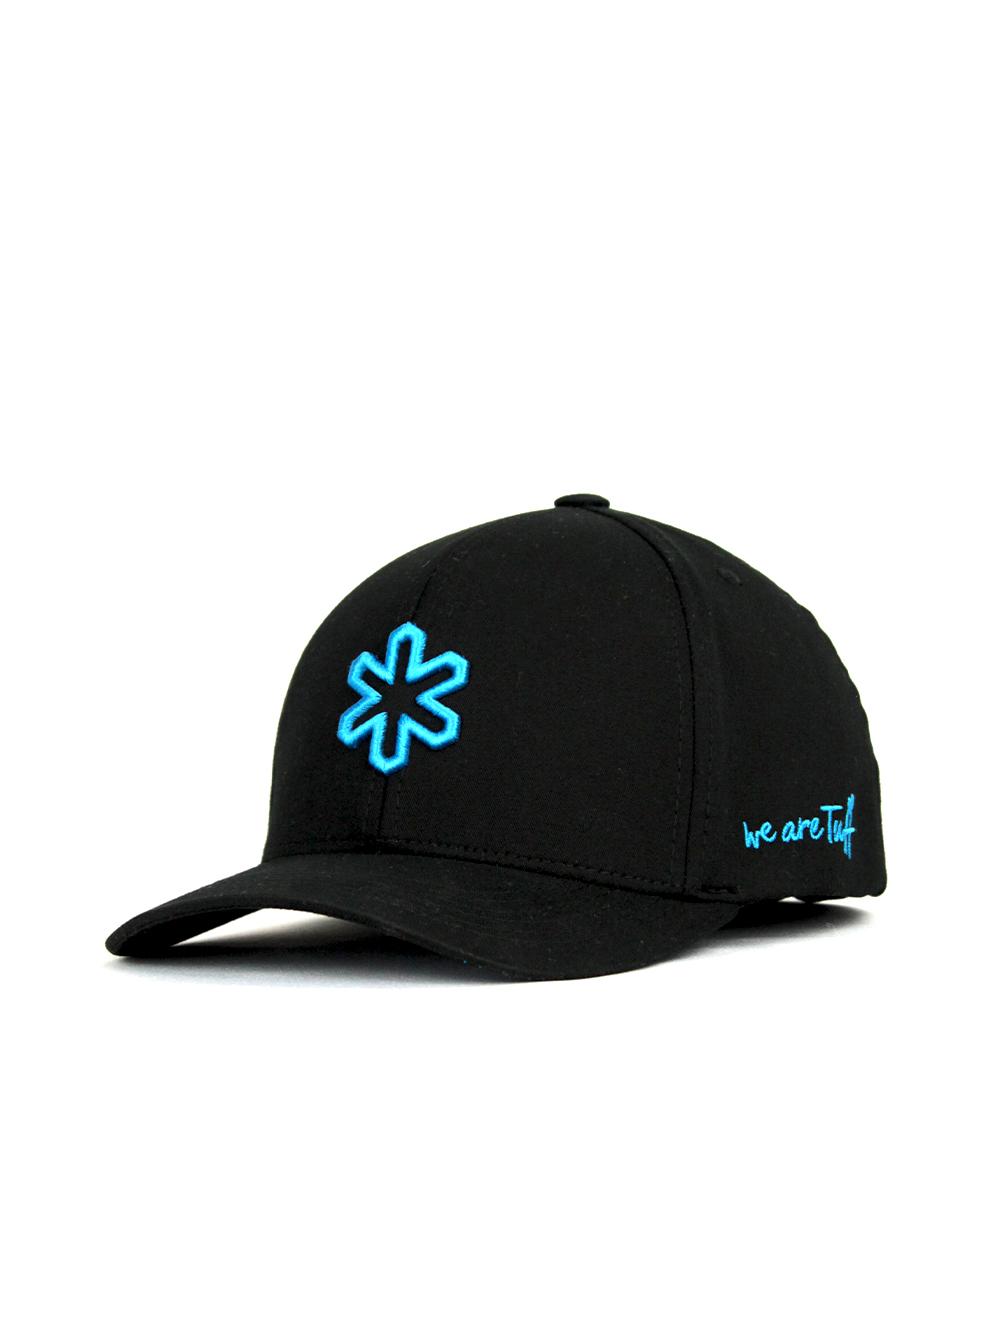 Bone TUFF Elite Flex - Preto Logo Azul